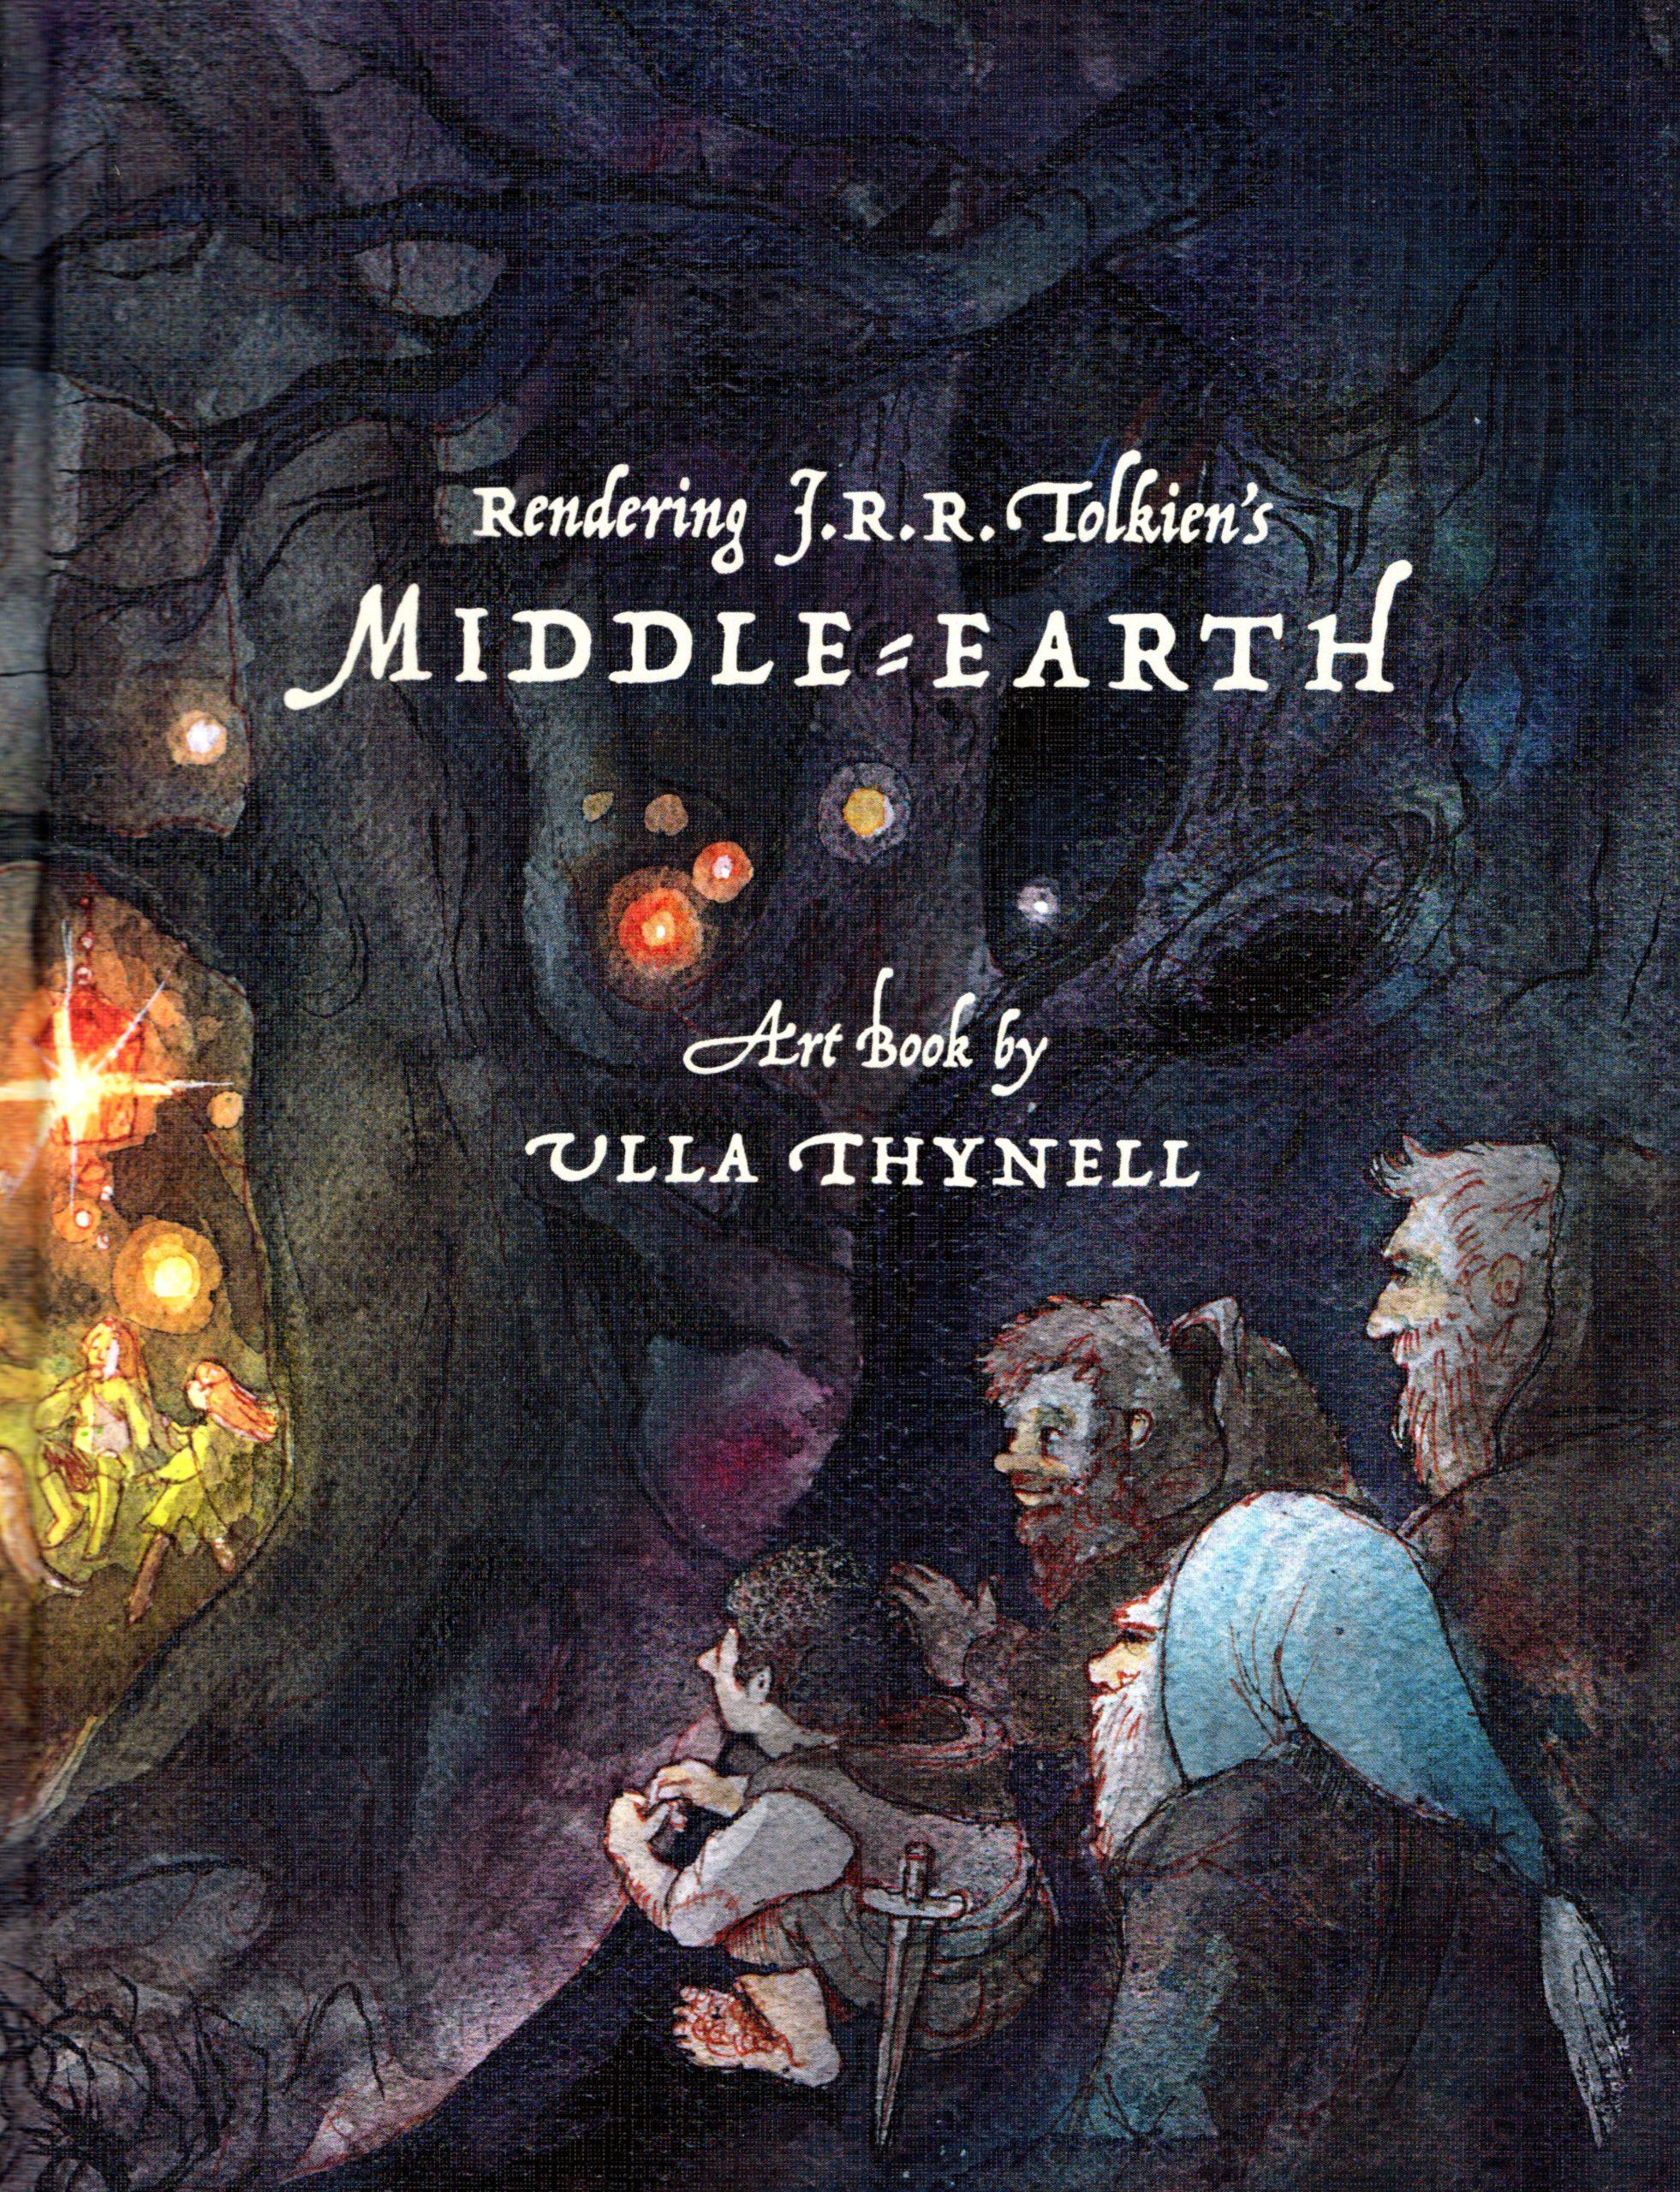 Ulla Thynell book